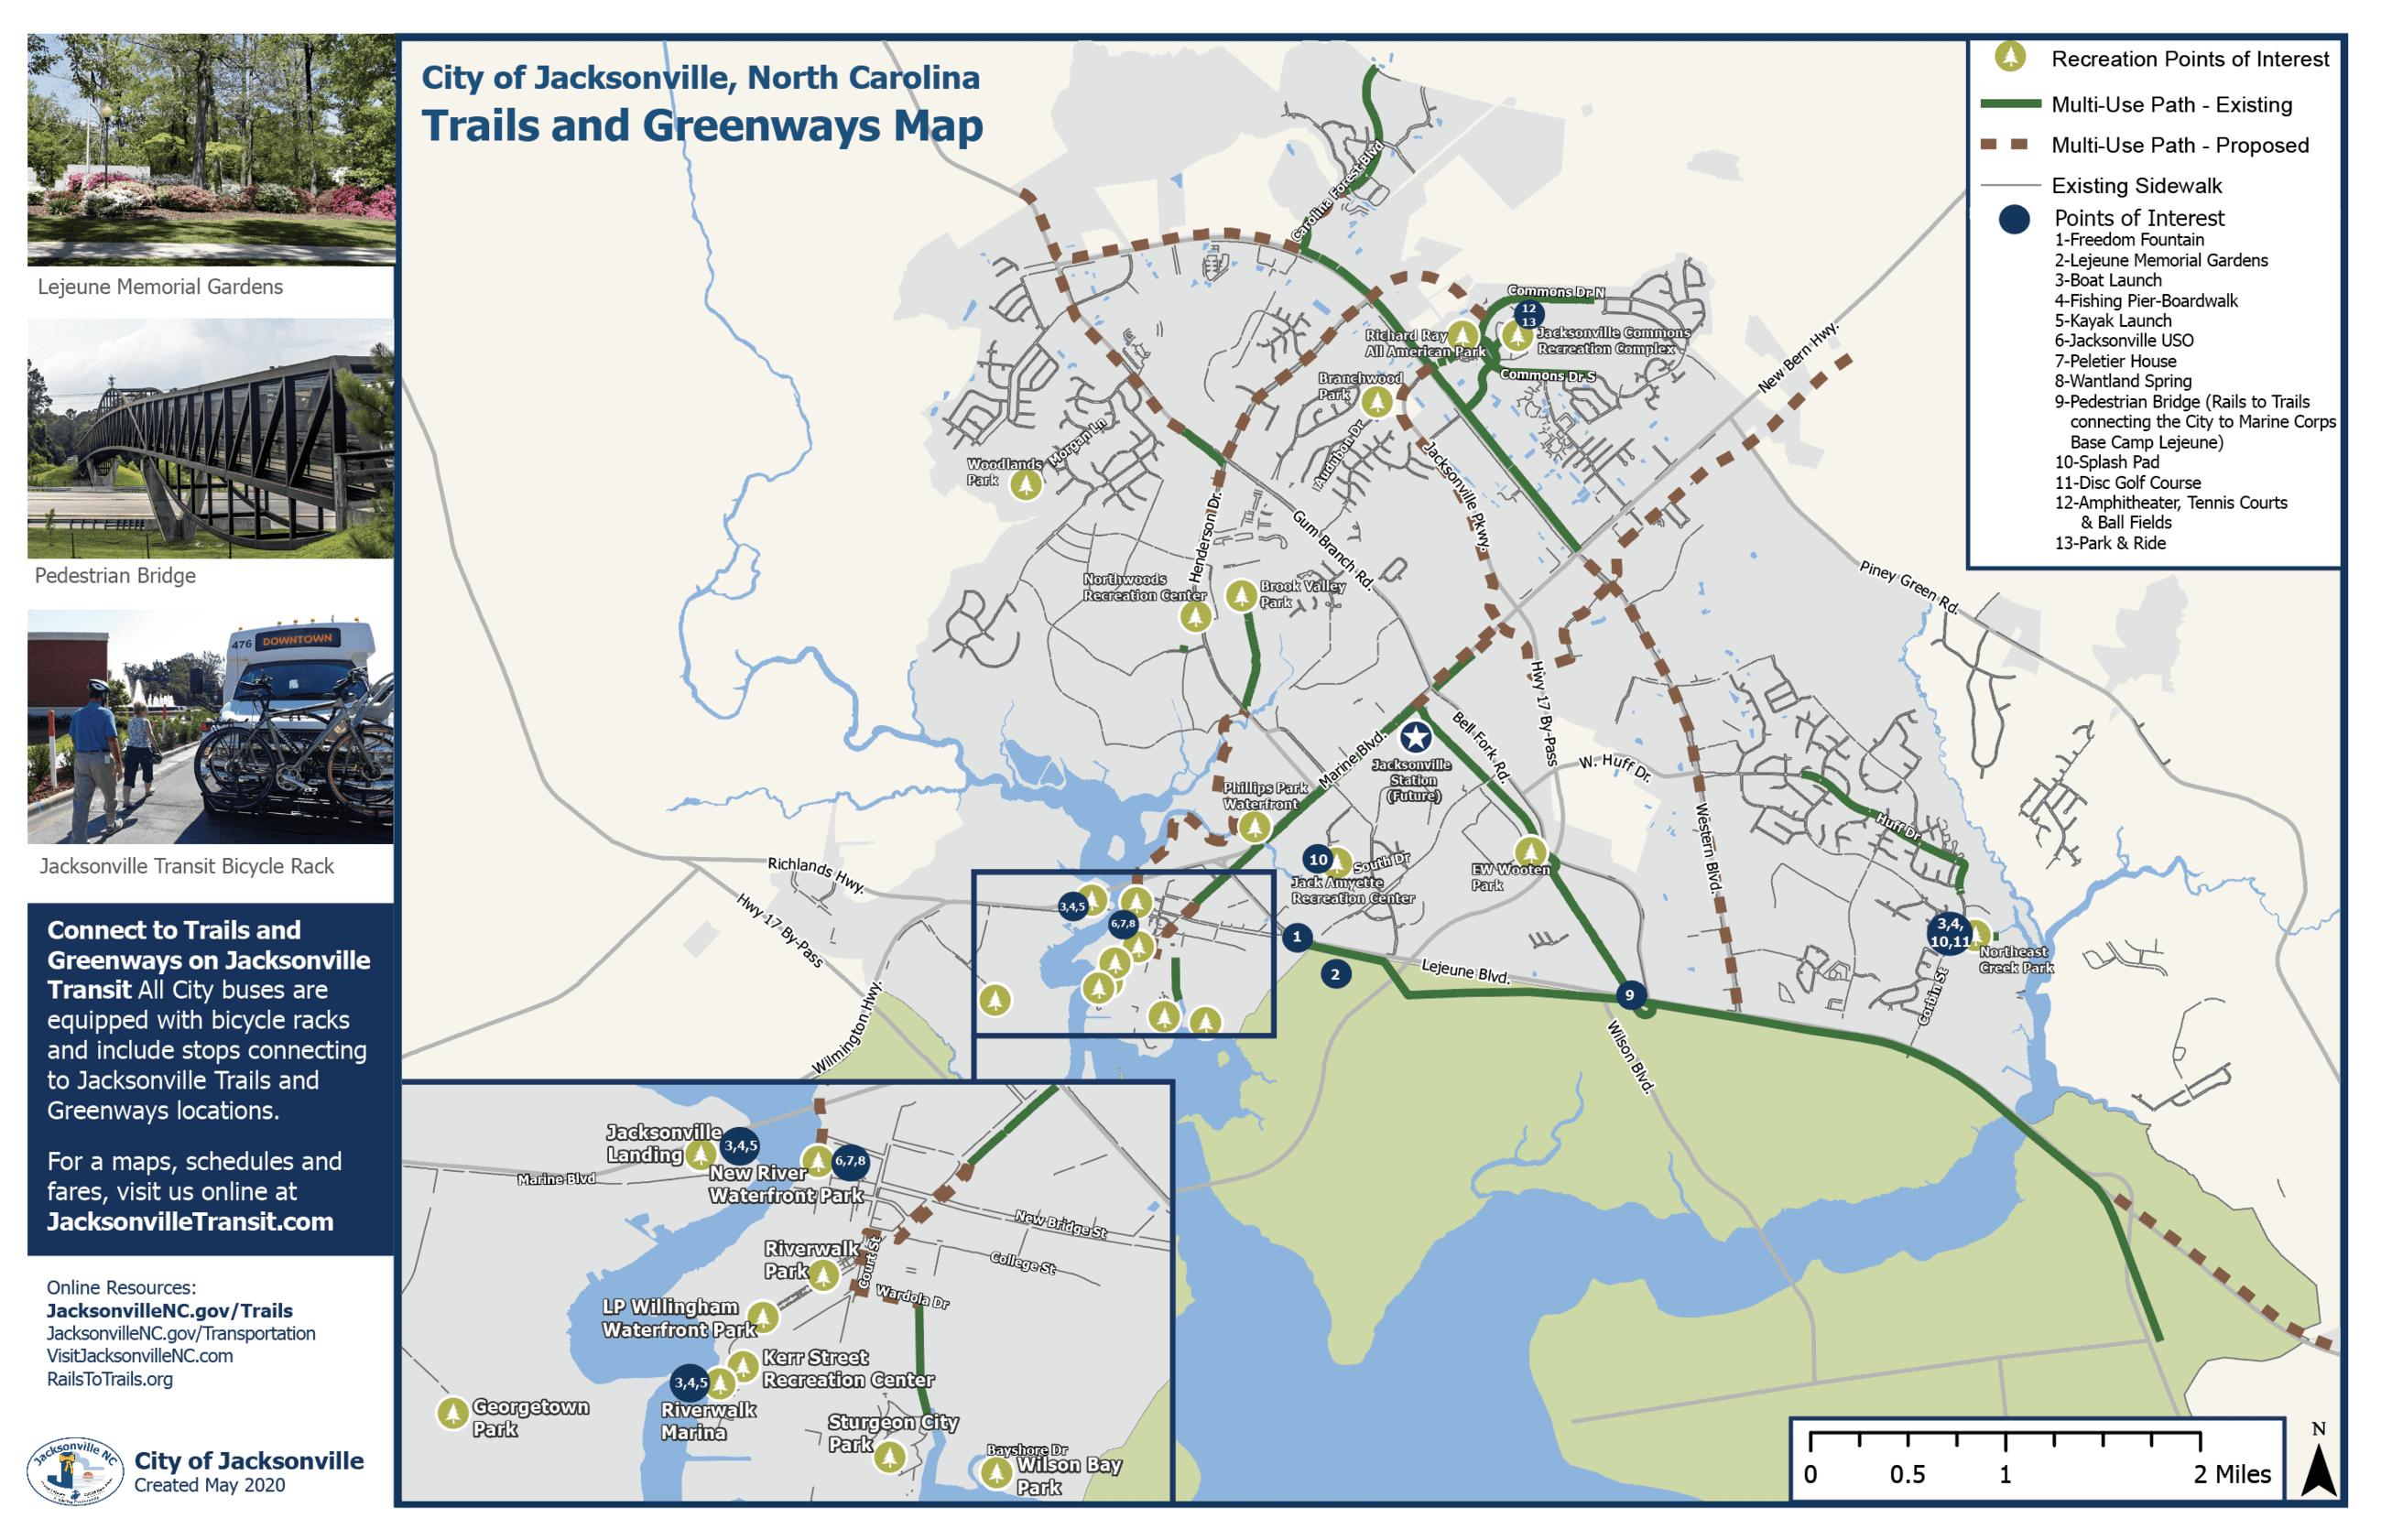 Trails & Greenways Map